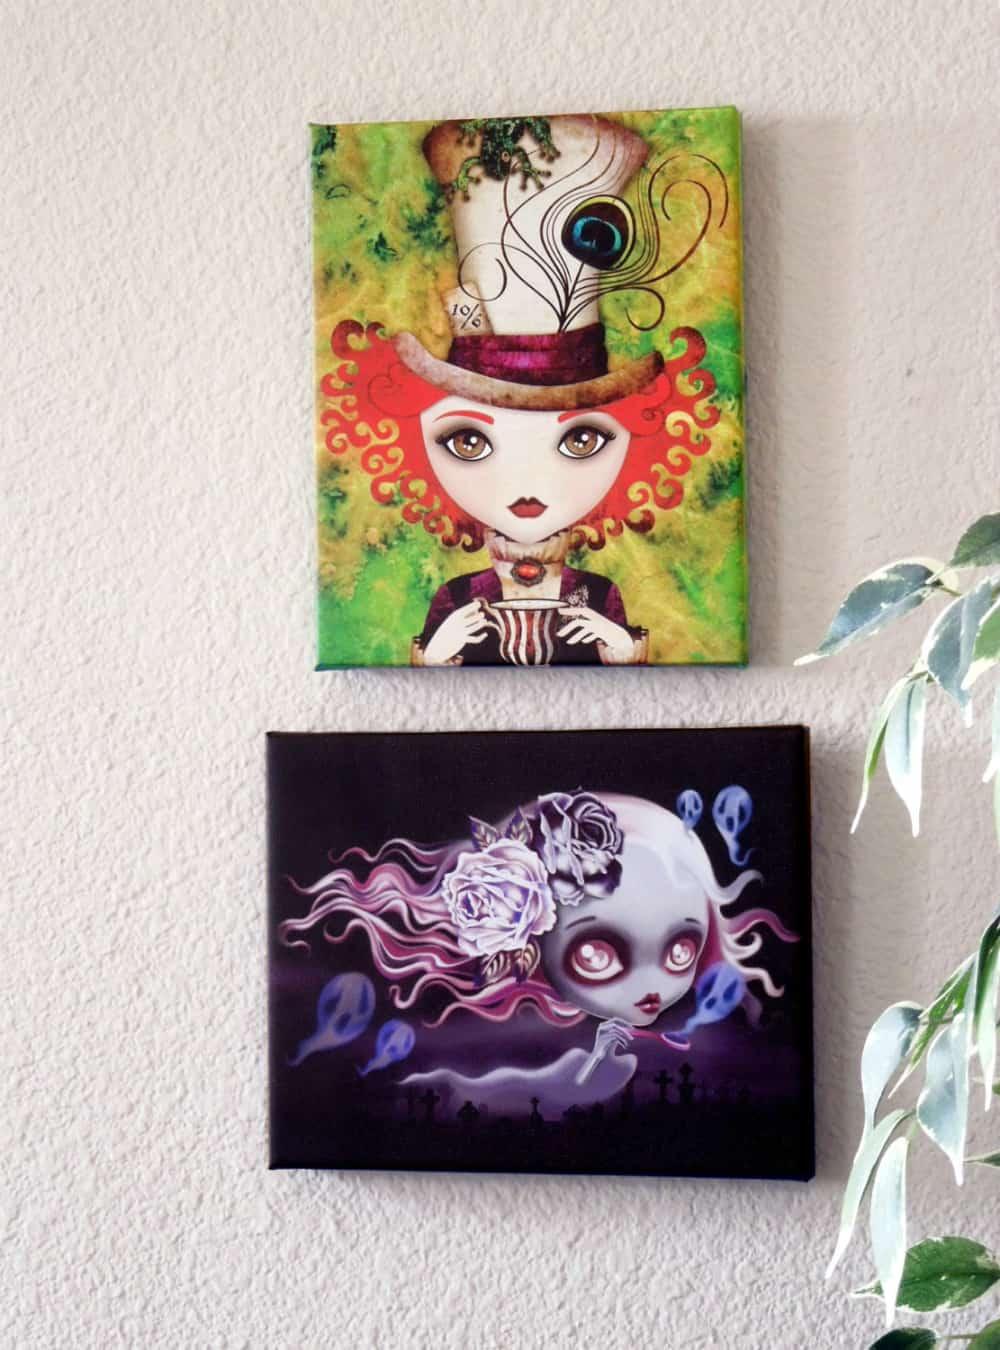 ghostly-luna-8×10-stretched-canvas-art-print